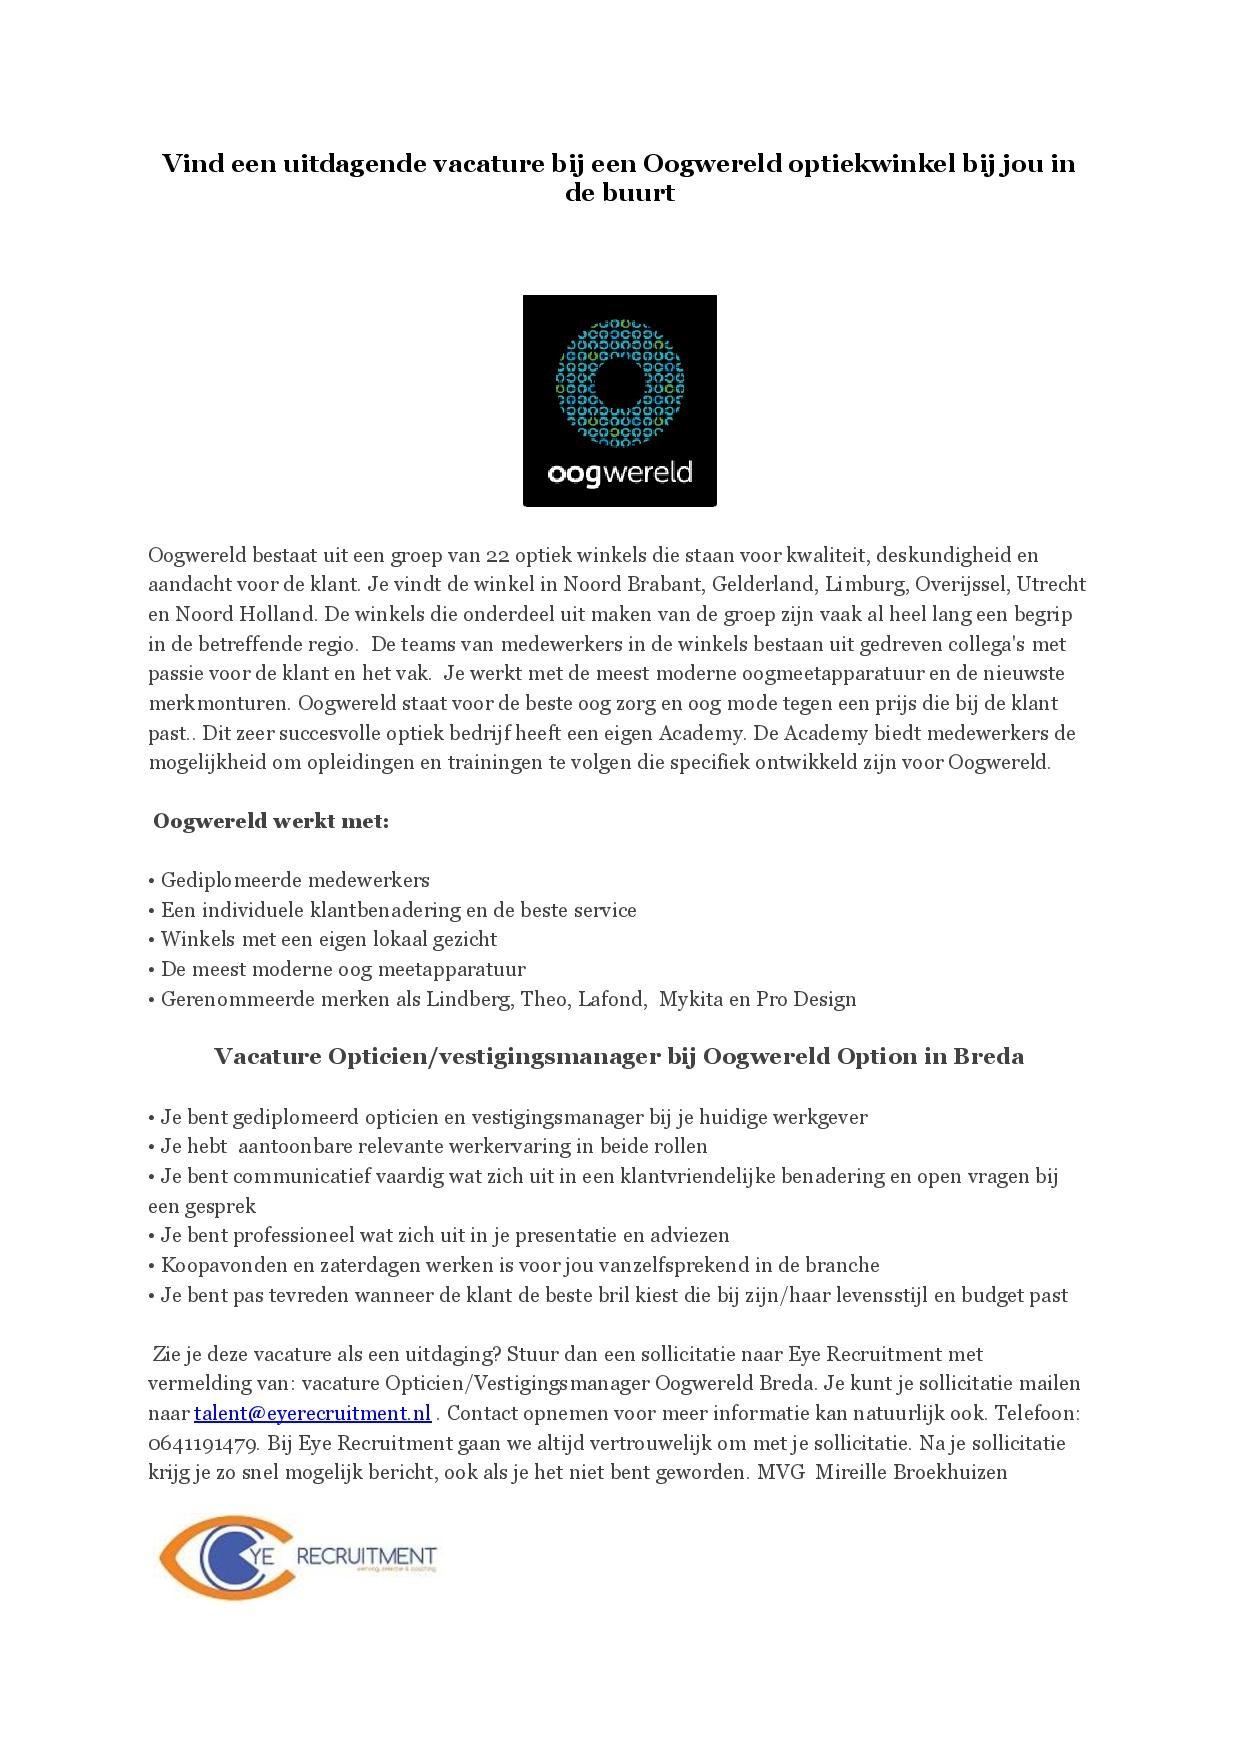 advertentie Oogwereld Breda-page-001